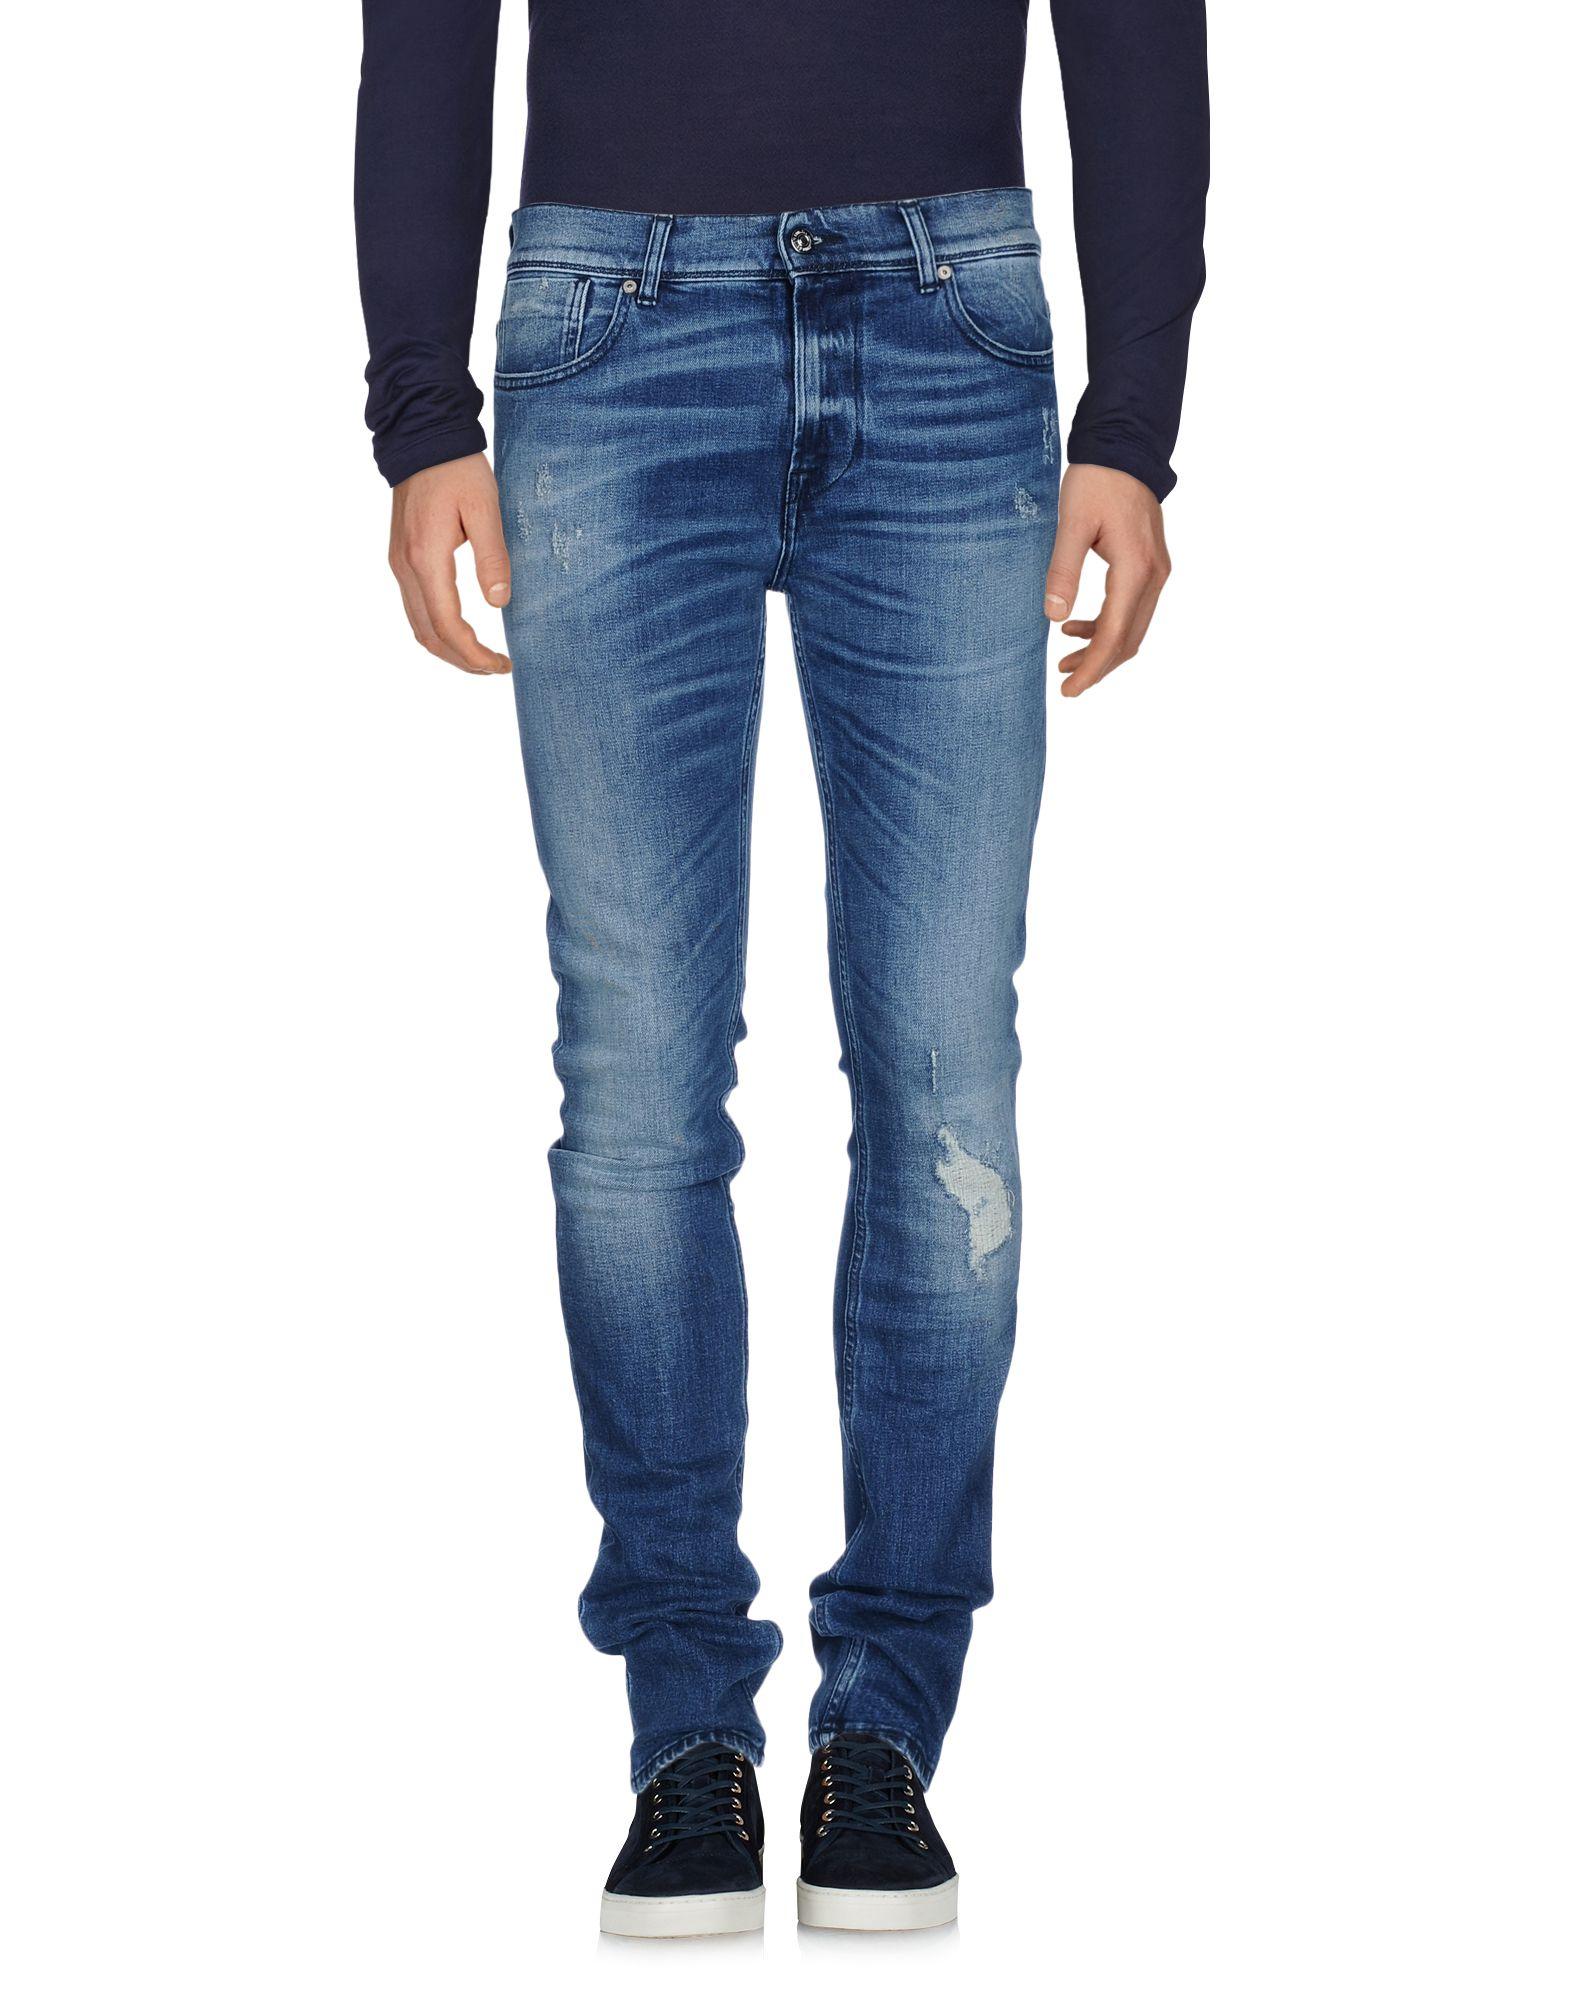 7 FOR ALL MANKIND Herren Jeanshose Farbe Blau Größe 6